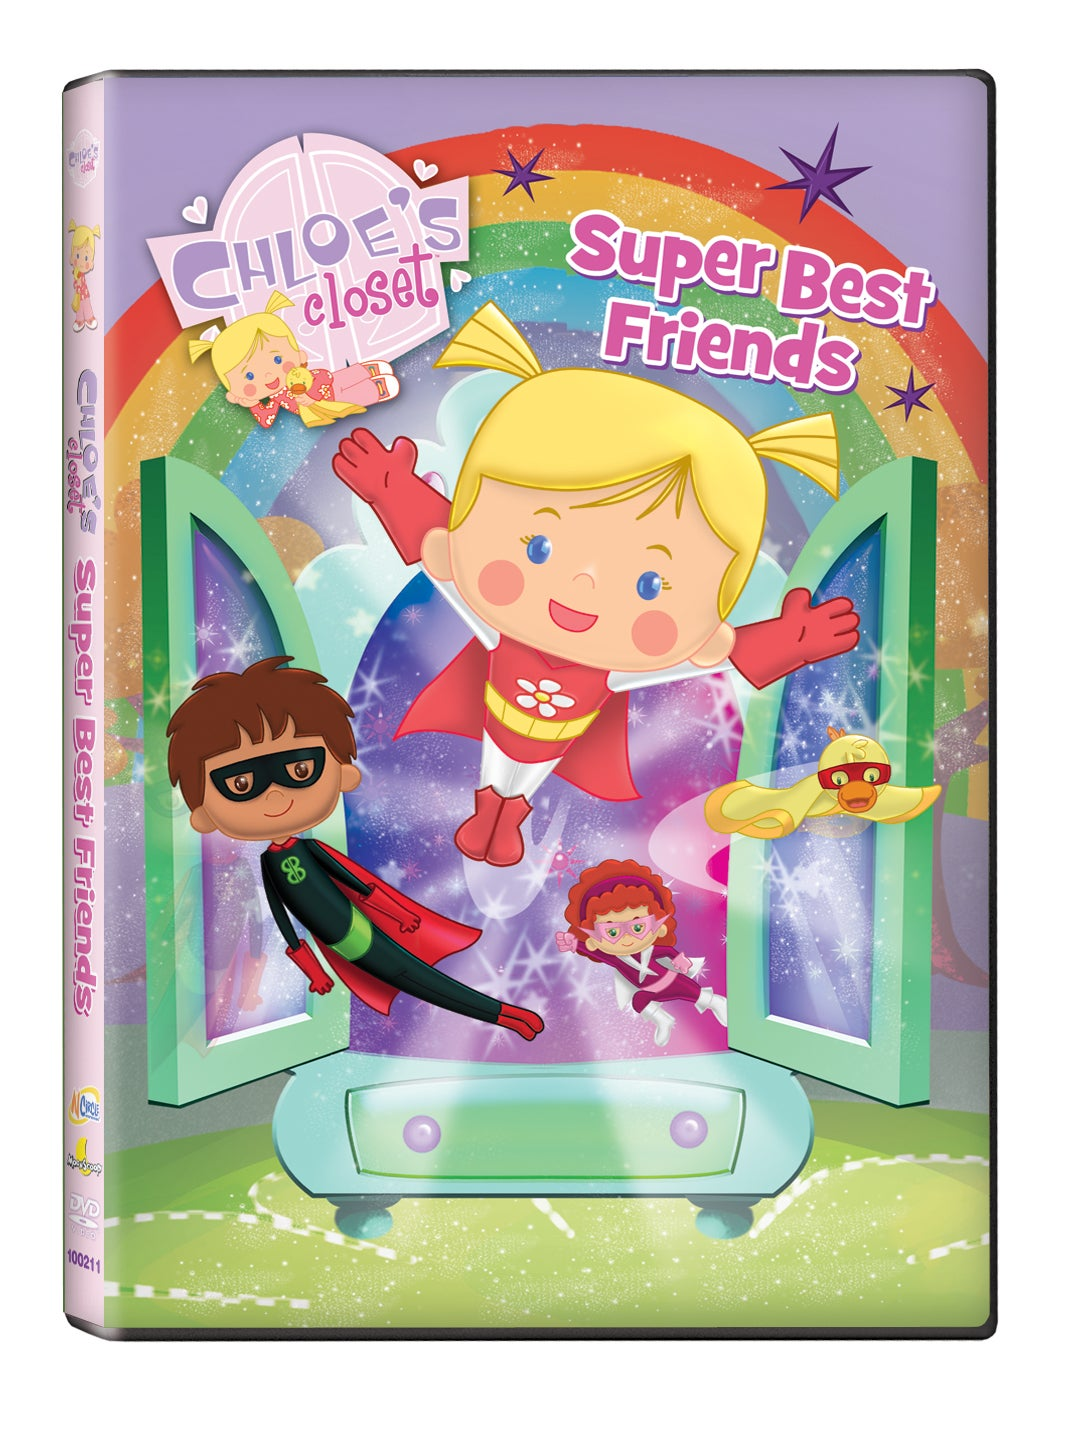 Chloe's Closet: Super Best Friends (DVD)